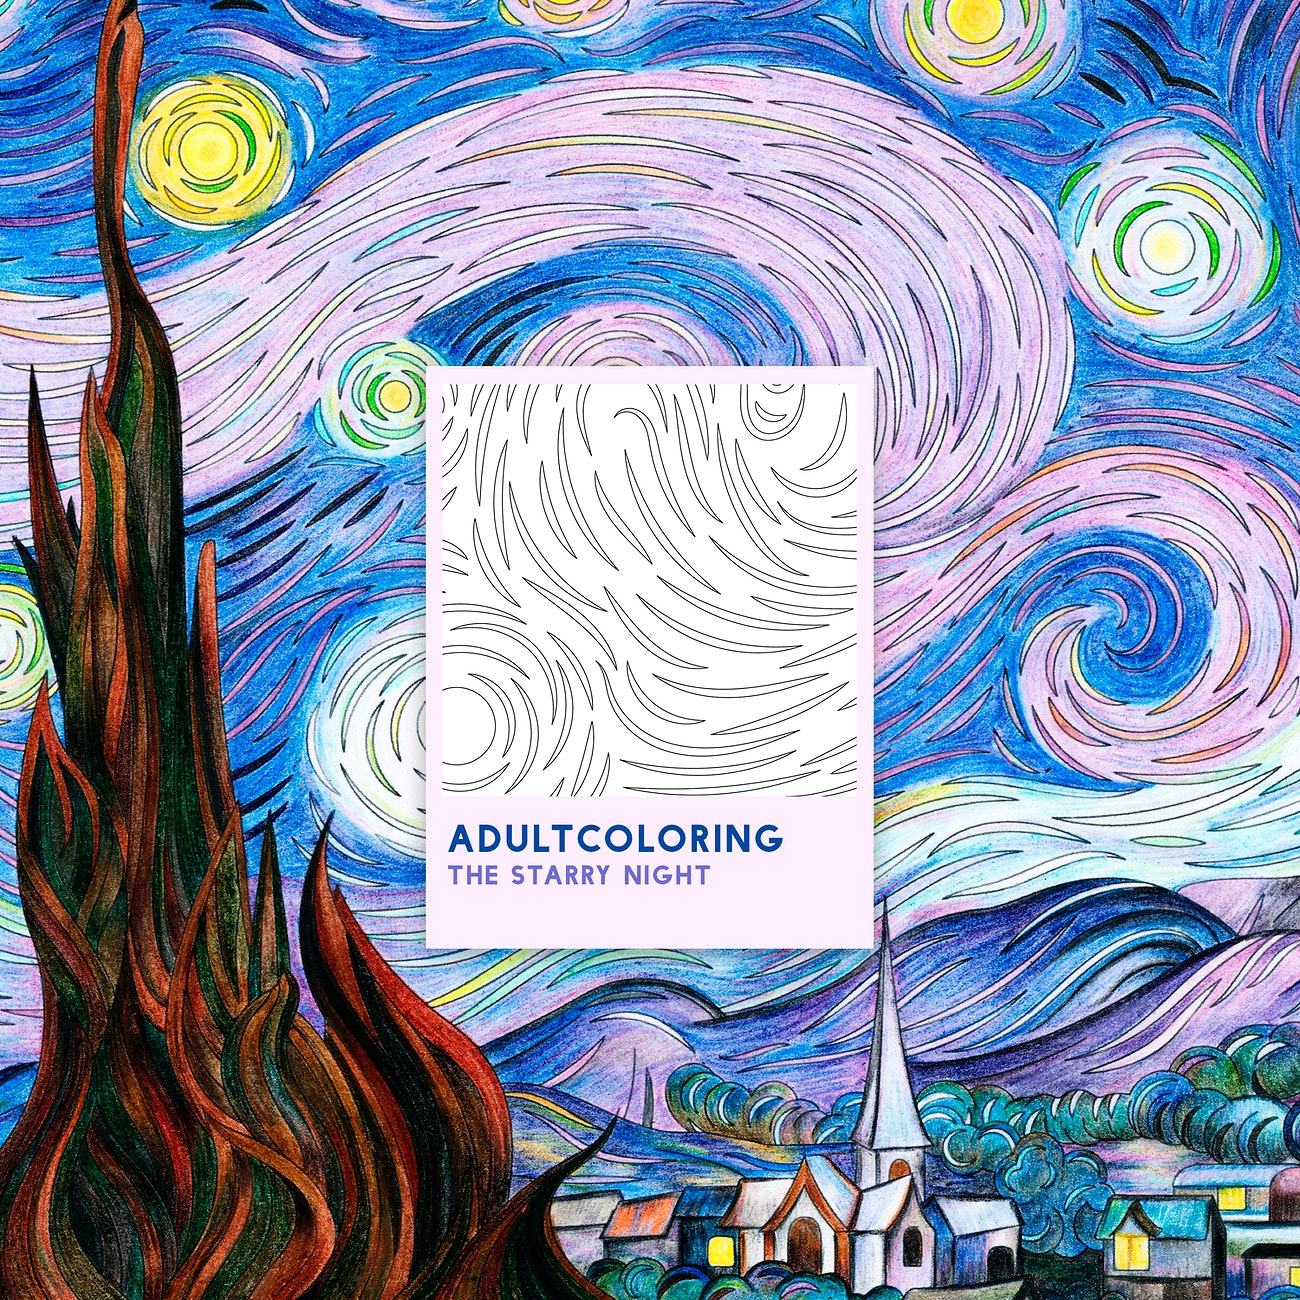 Bedroom at Arles By Vincent Van Gogh coloring page | Free ... | 1300x1300